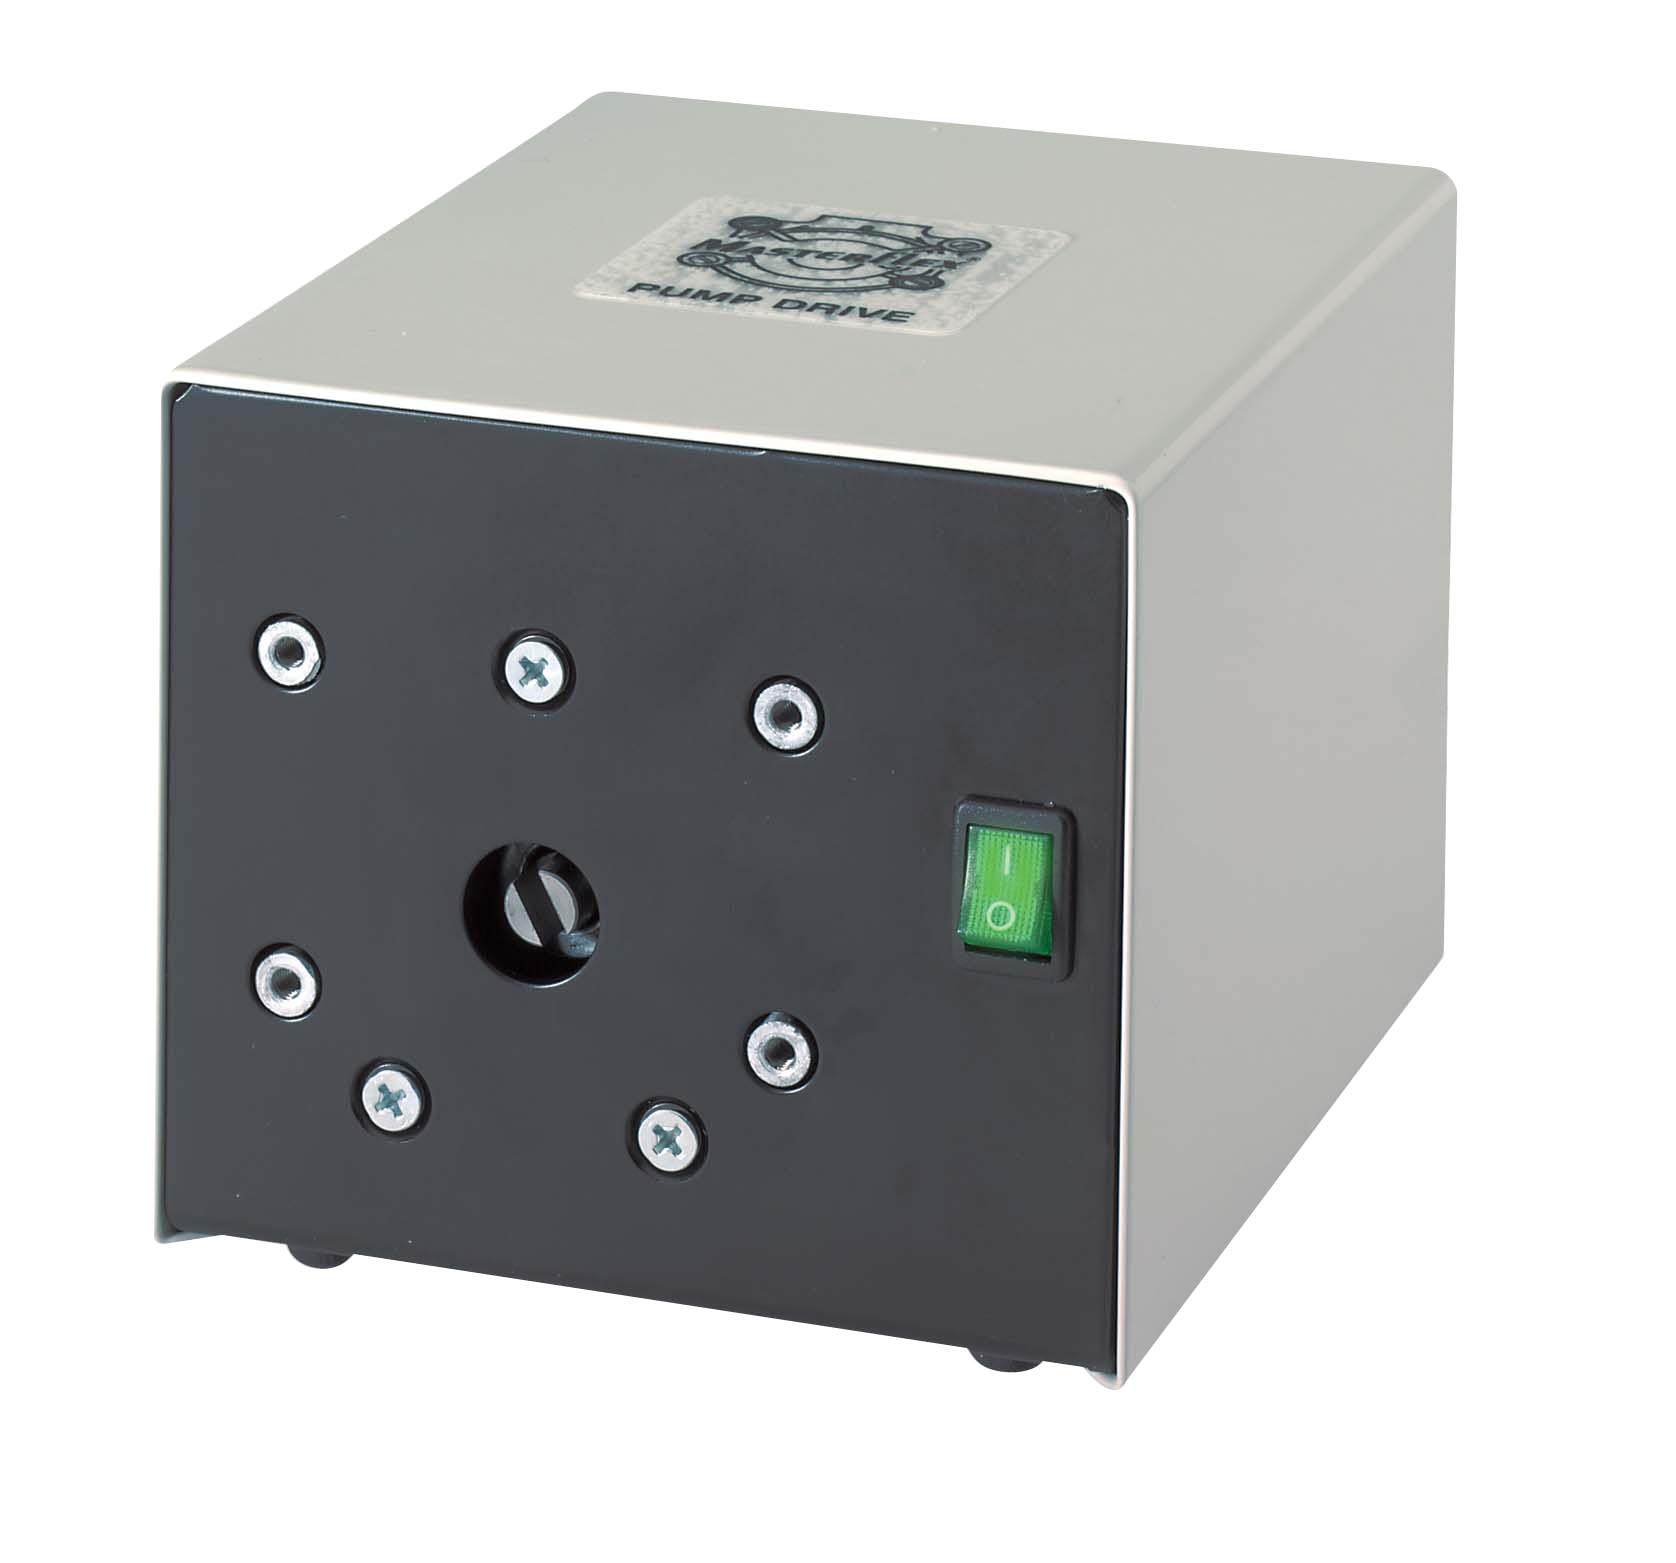 Bomba Compacta de Velocidad Fija Masterflex L/S Image